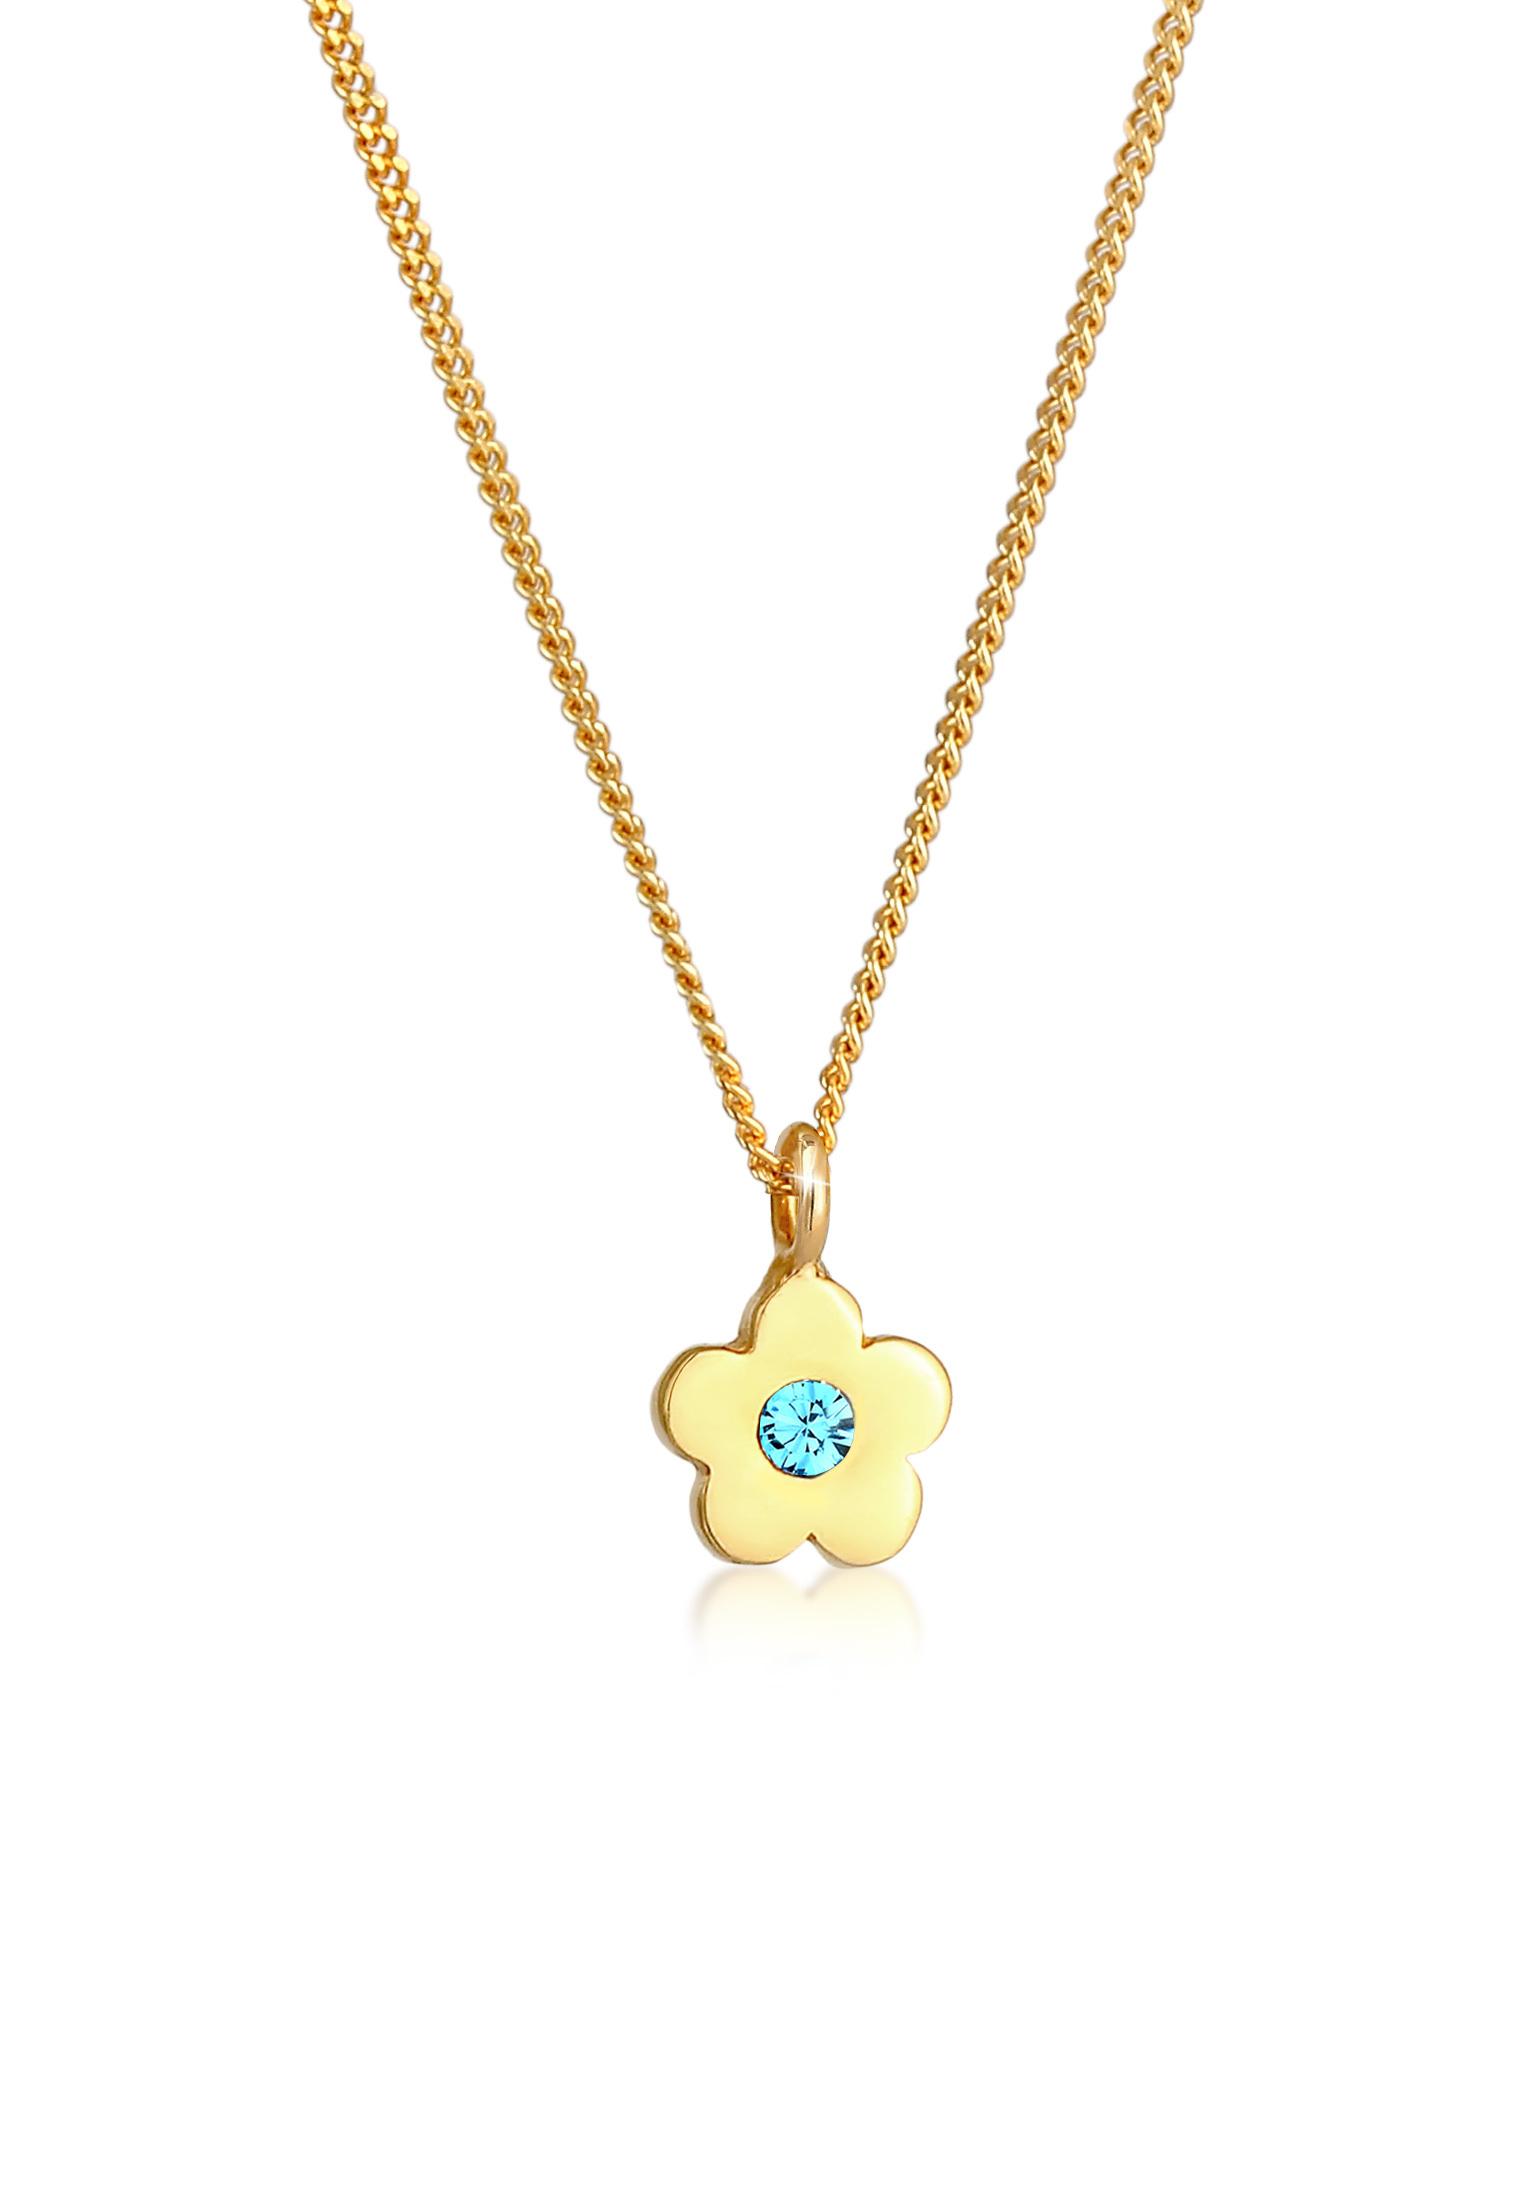 Halskette Blume | Kristall ( Hellblau ) | 925 Sterling Silber vergoldet